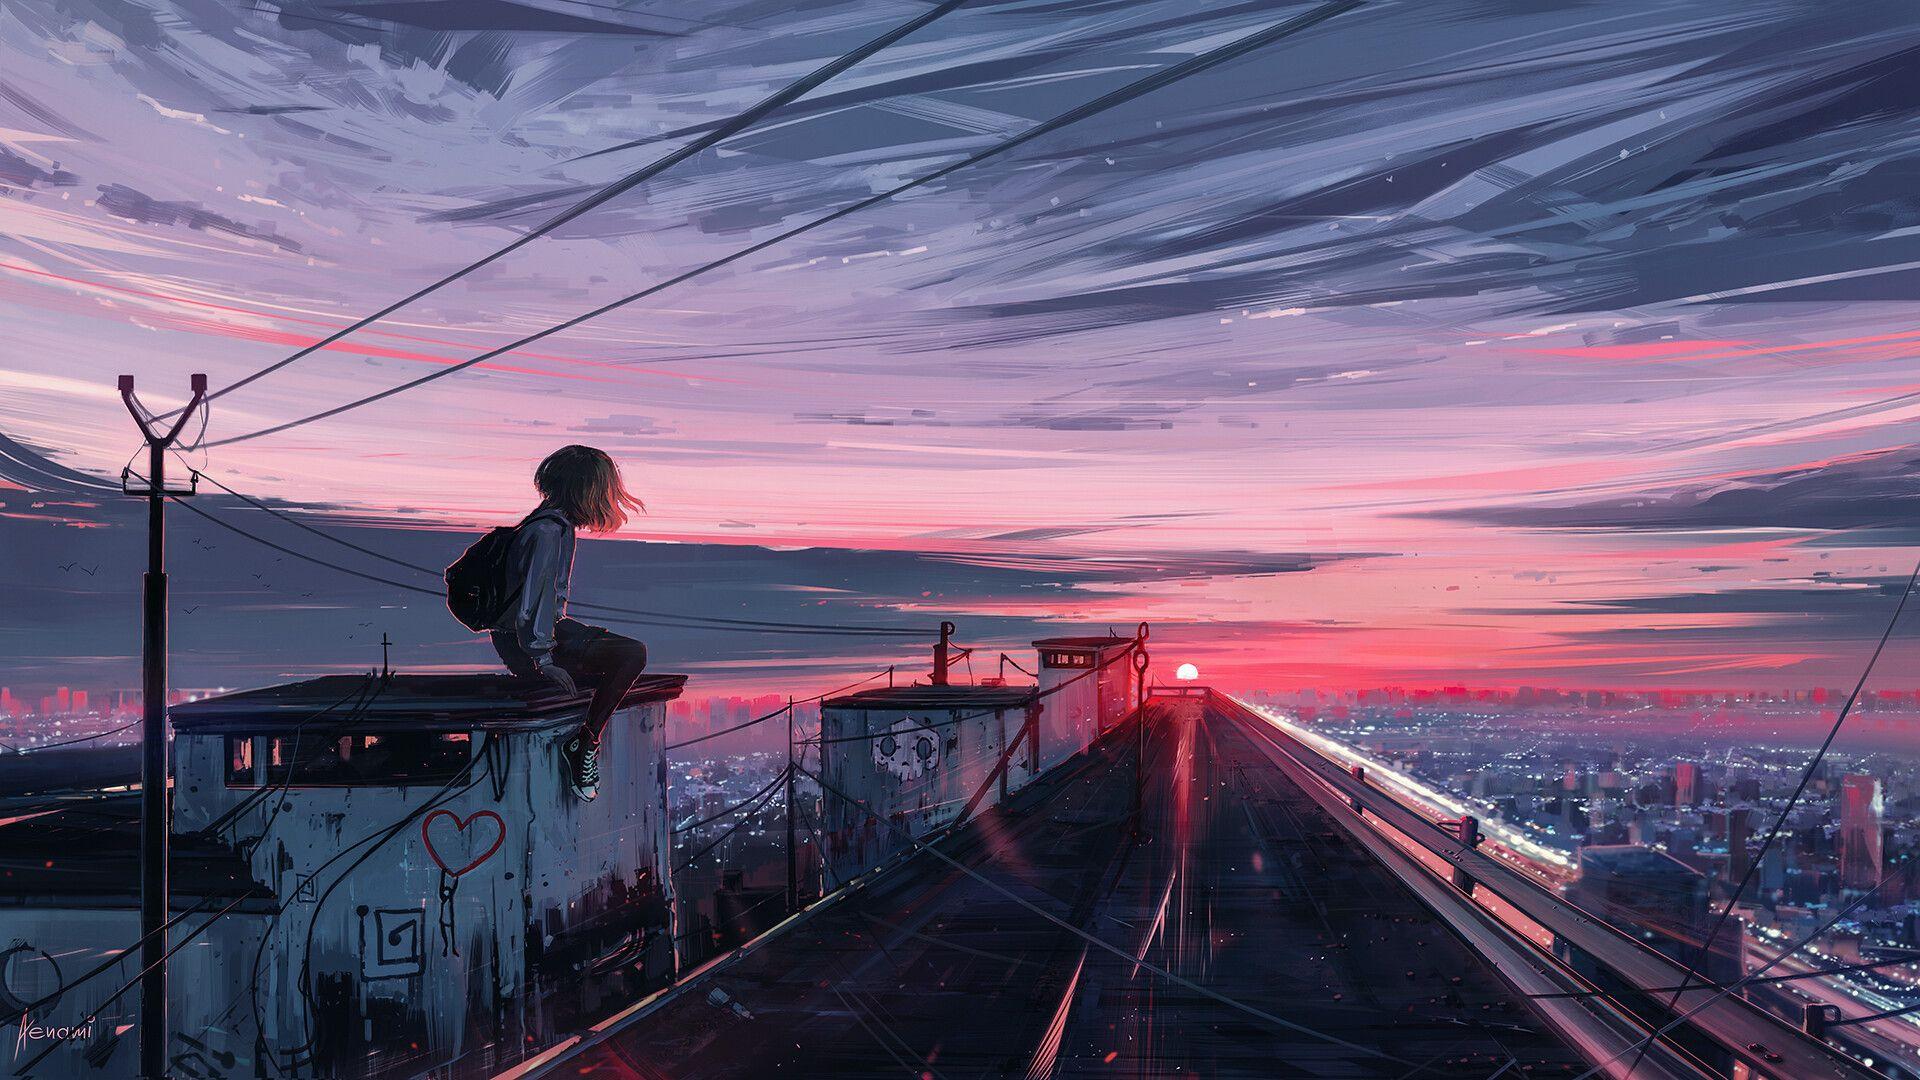 Dope desktop backgrounds anime wallpaper 1920x1080 free. ArtStation - Someday, Alena Aenami   Ảnh tường cho điện